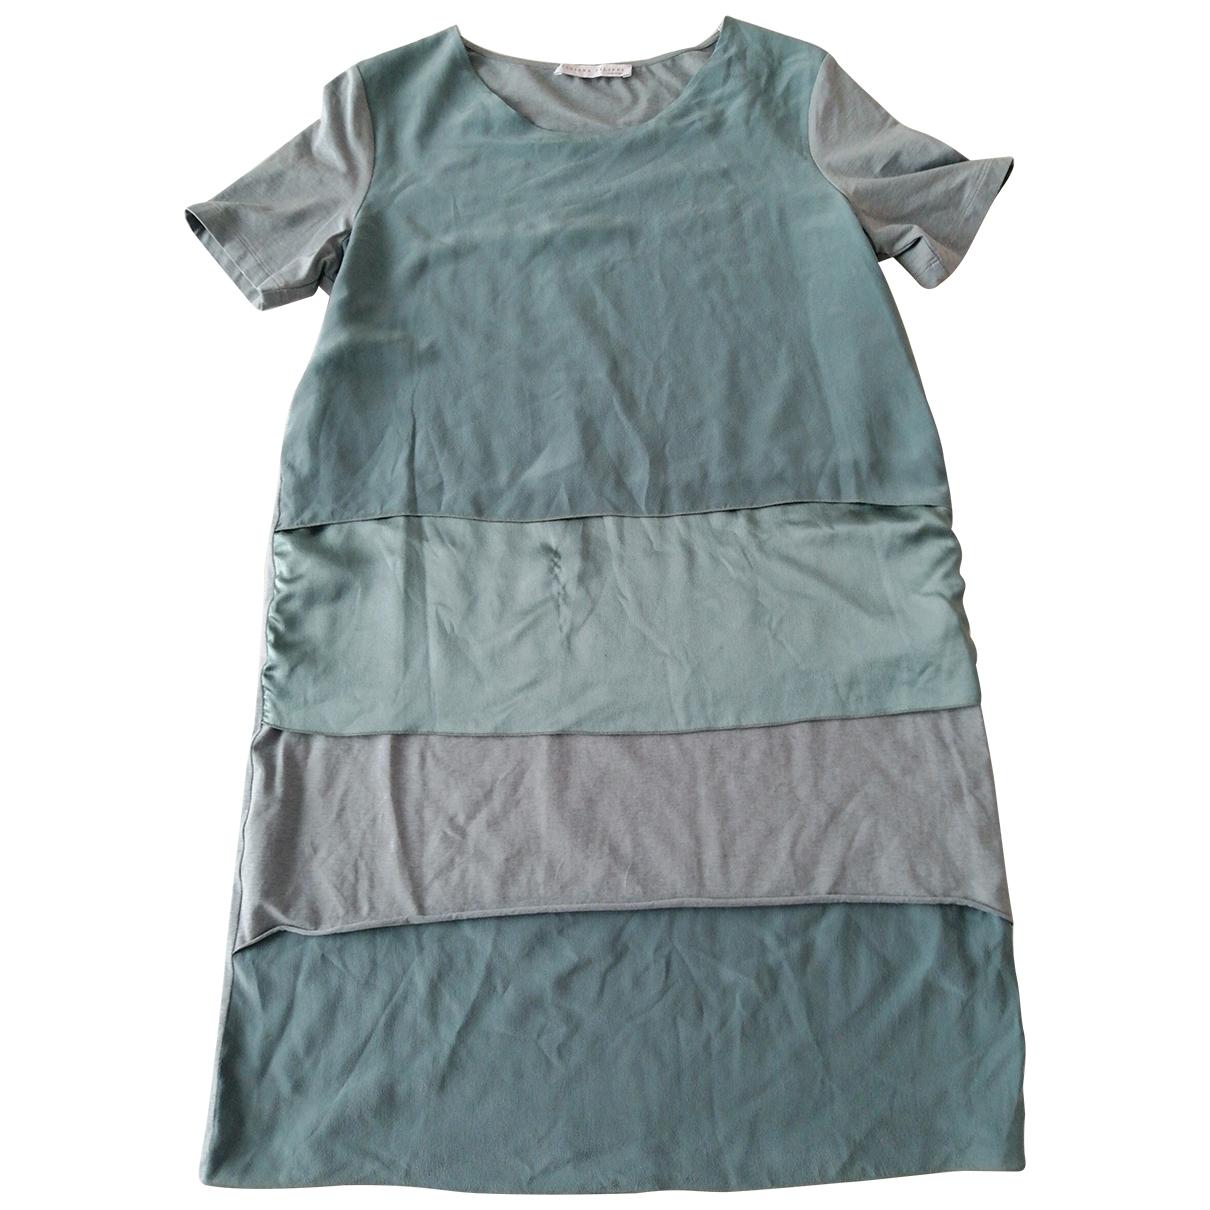 Fabiana Filippi \N Green Cotton dress for Women 44 IT